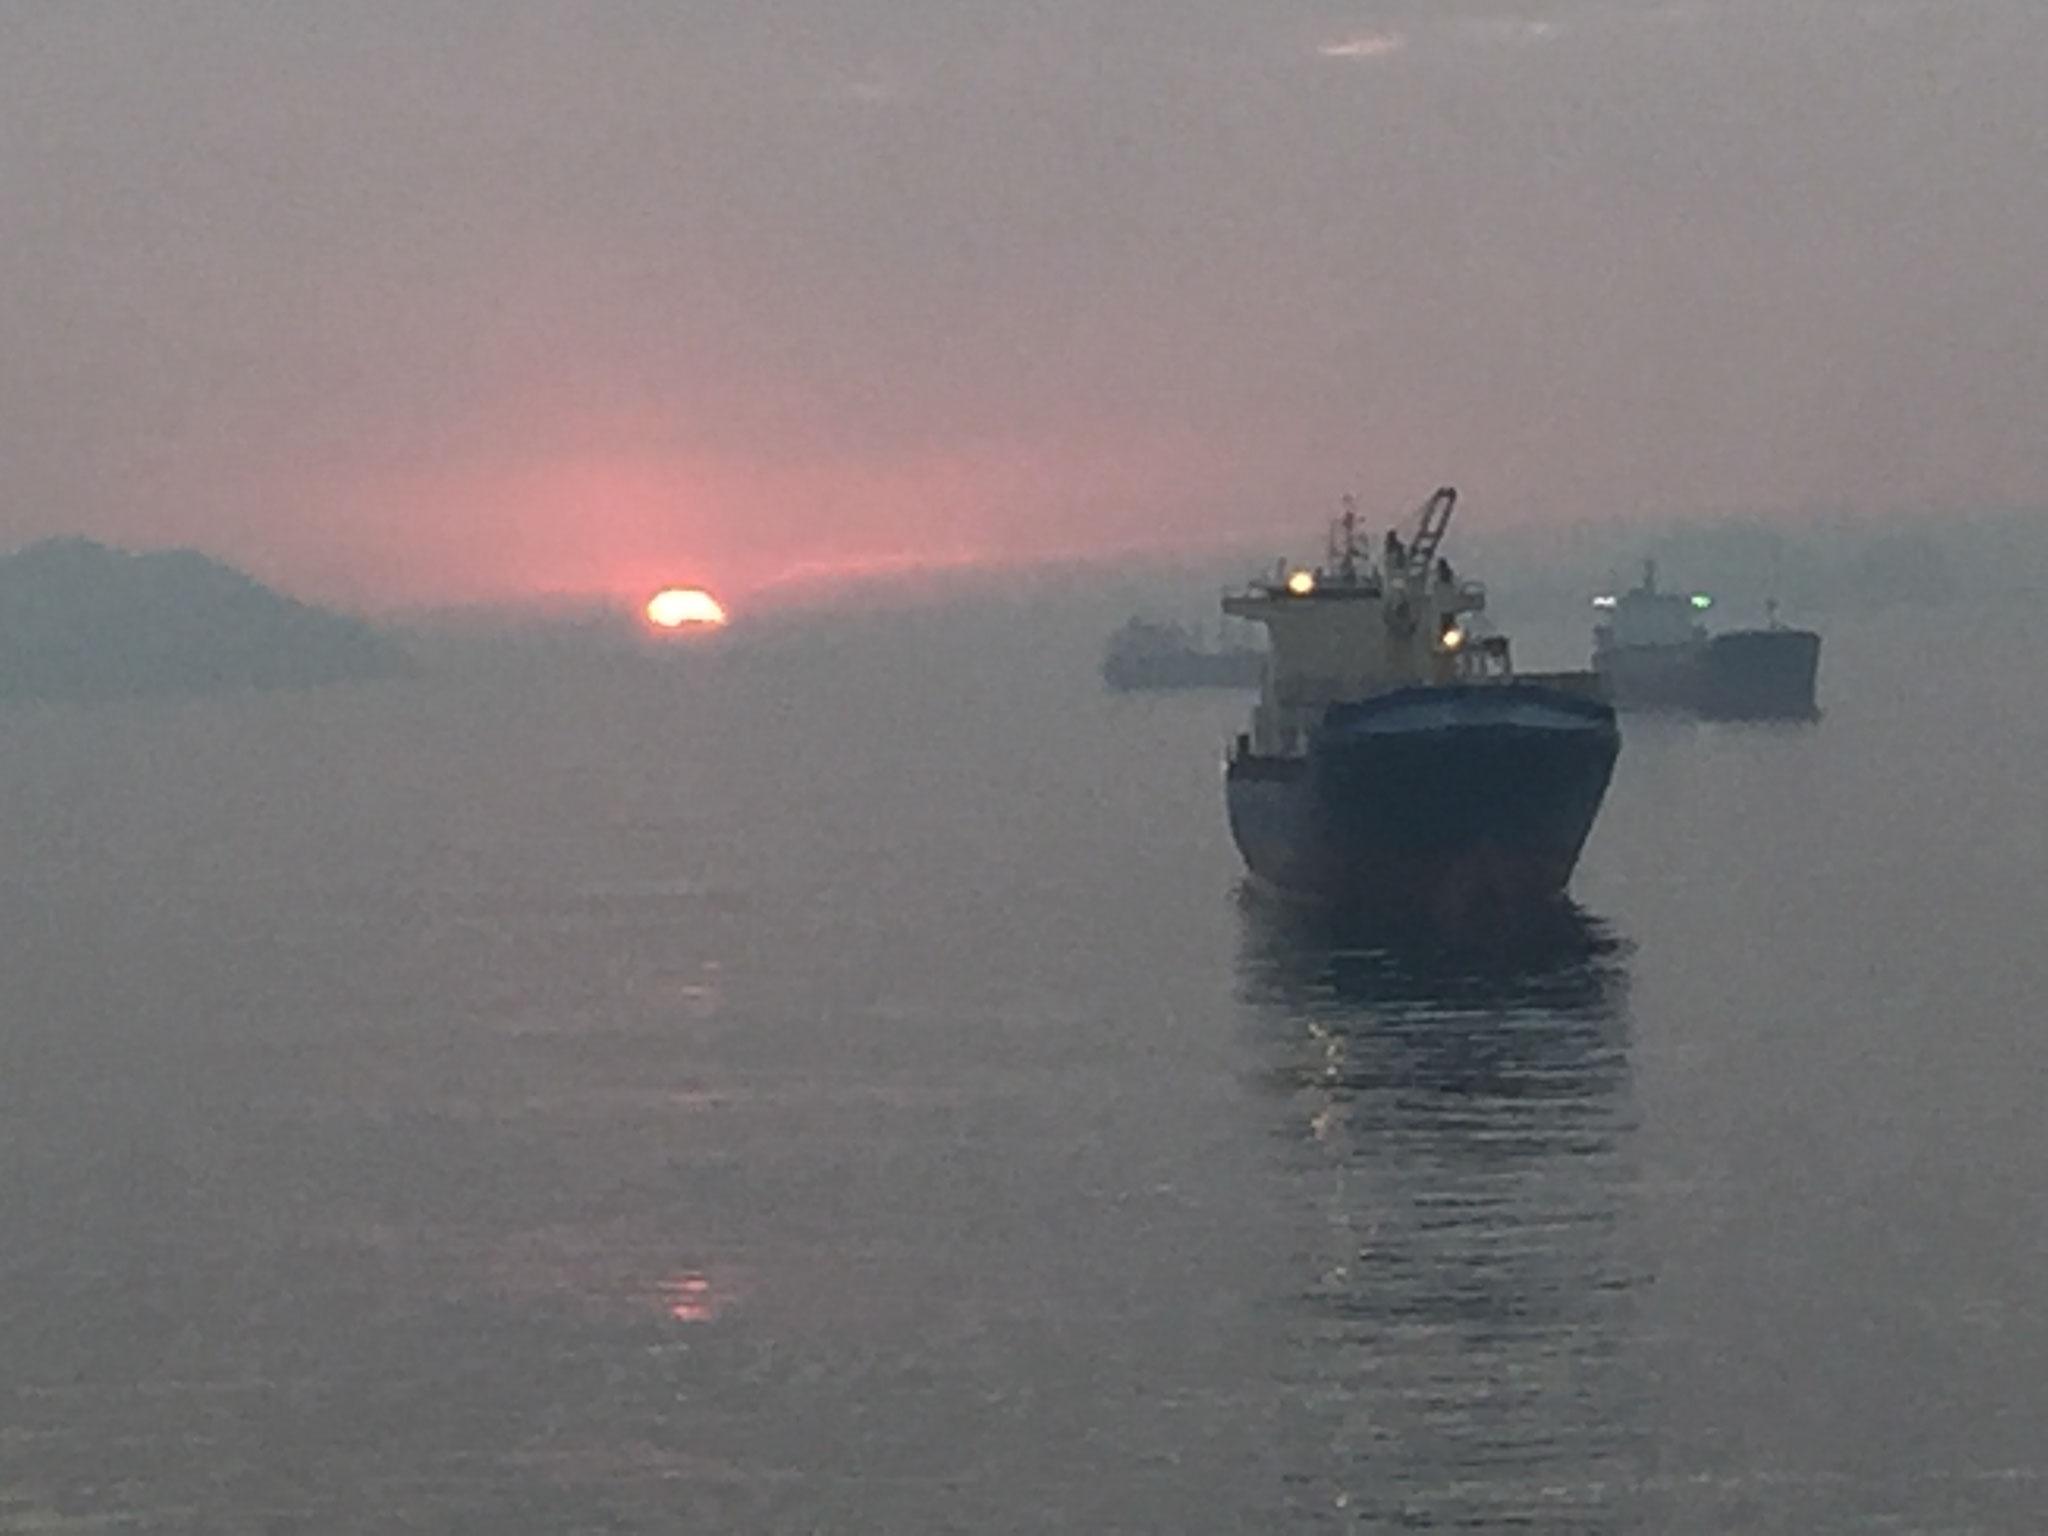 Morgensonne vor Santos